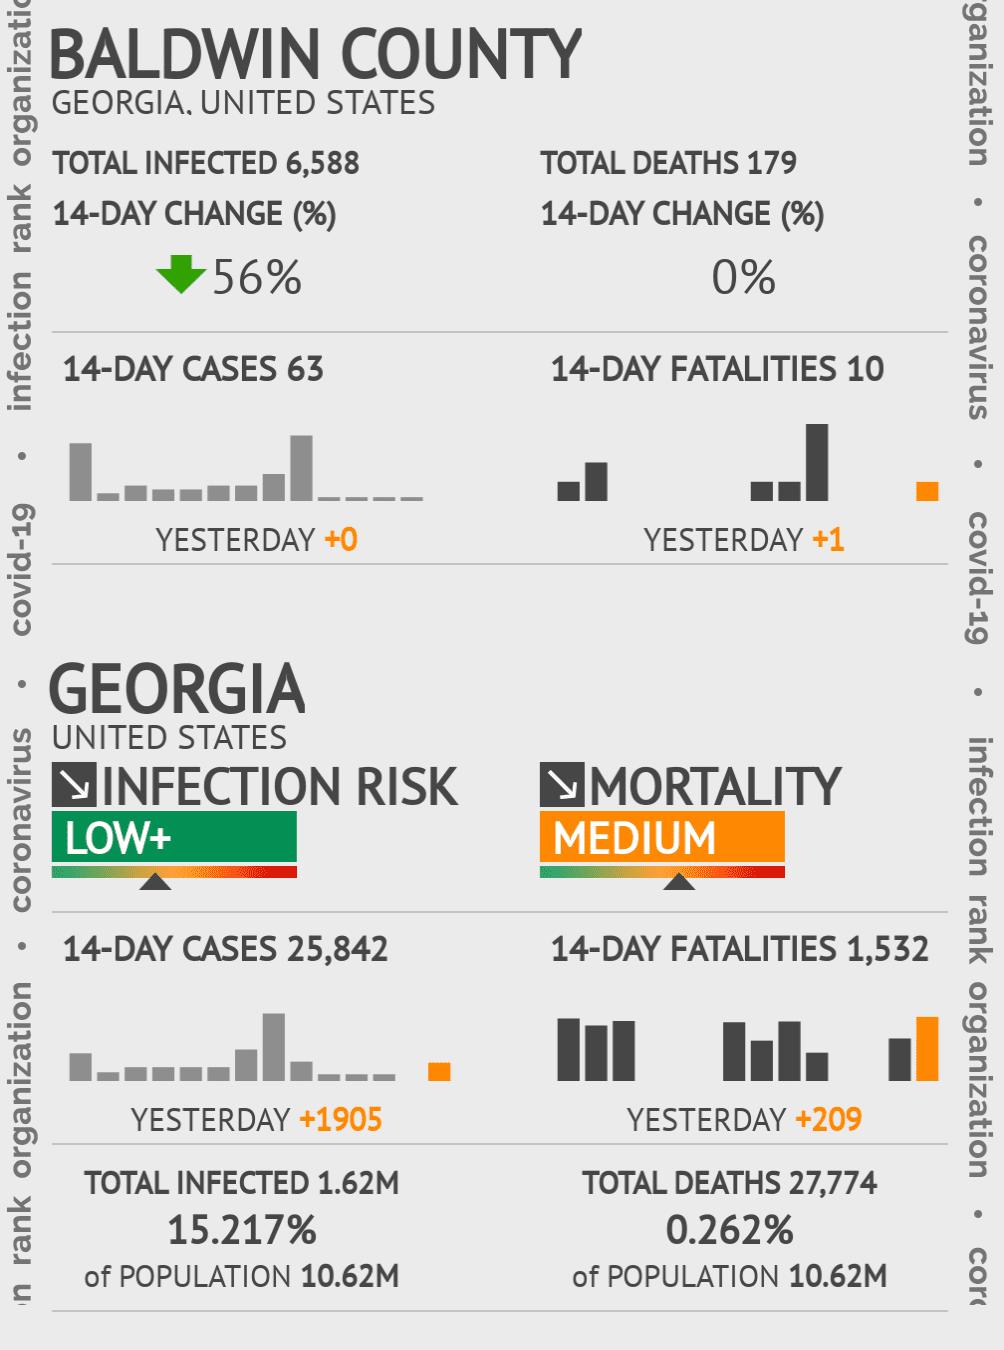 Baldwin County Coronavirus Covid-19 Risk of Infection on January 22, 2021